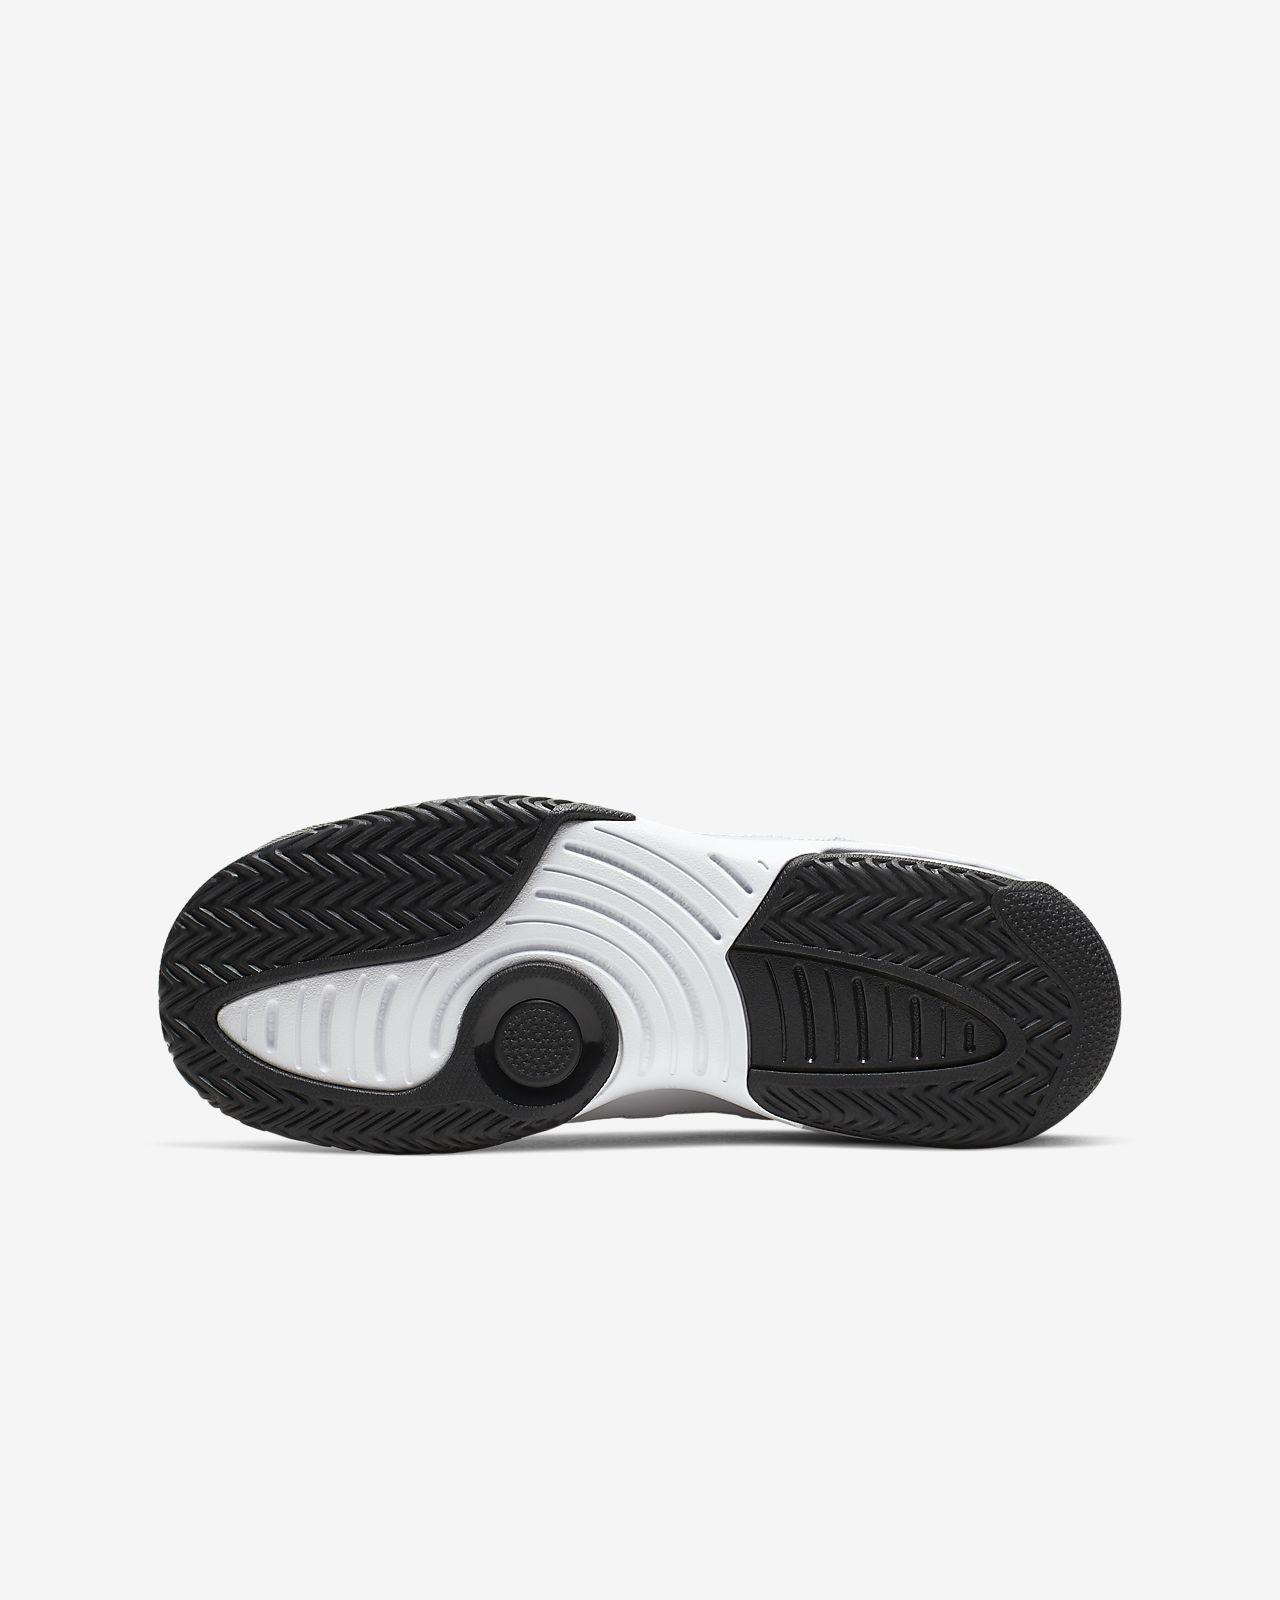 new concept ac61e bf8b2 Jordan Max Aura Older Kids' (Boys') Shoe